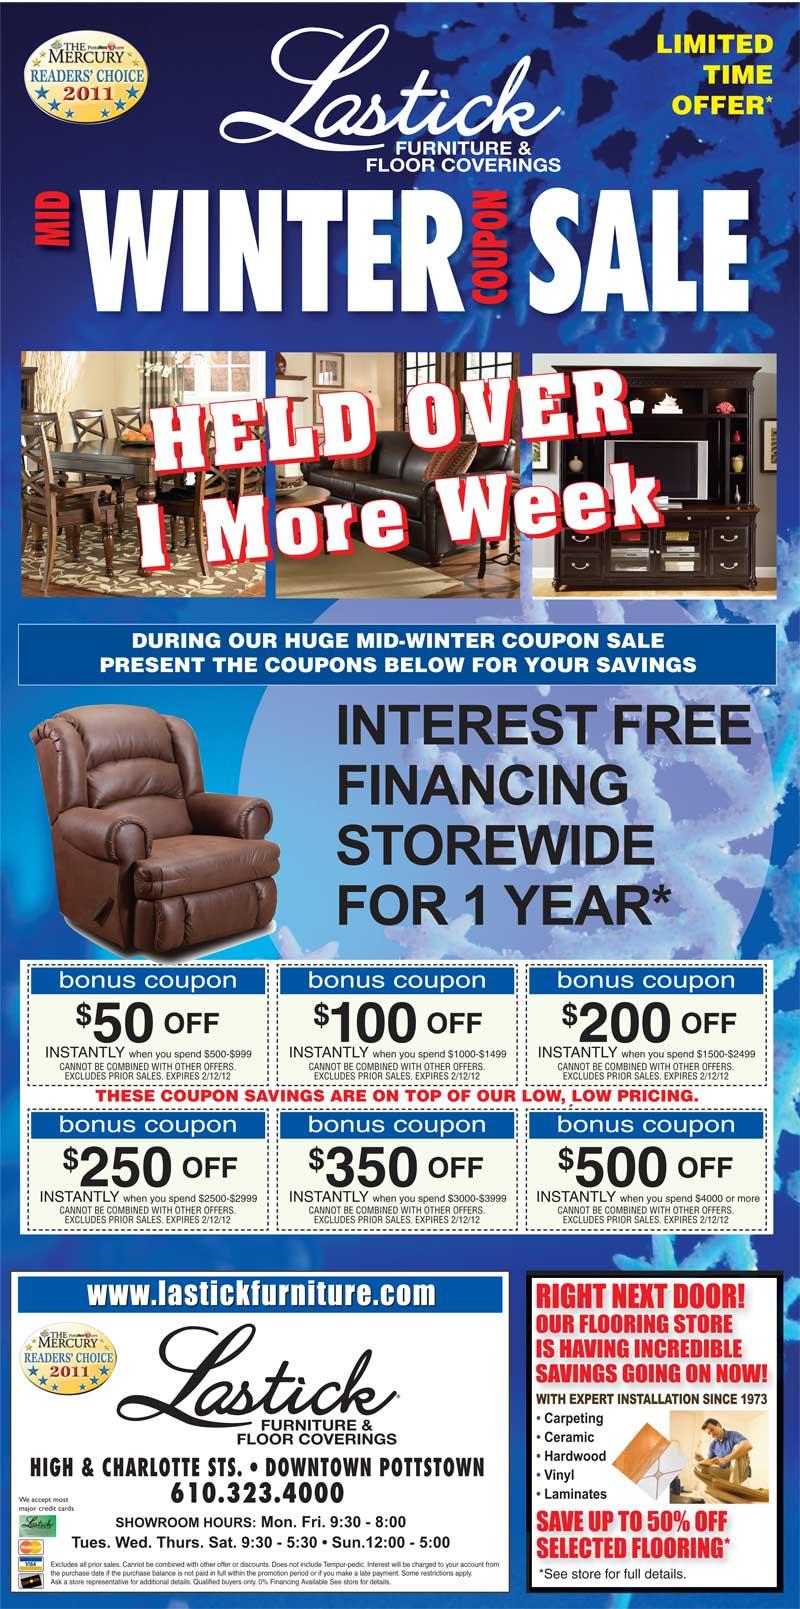 Lastick Furniture U0026 Floor Coverings HUGE Mid Winter Coupon Sale Going On  Until Feb. 12th!